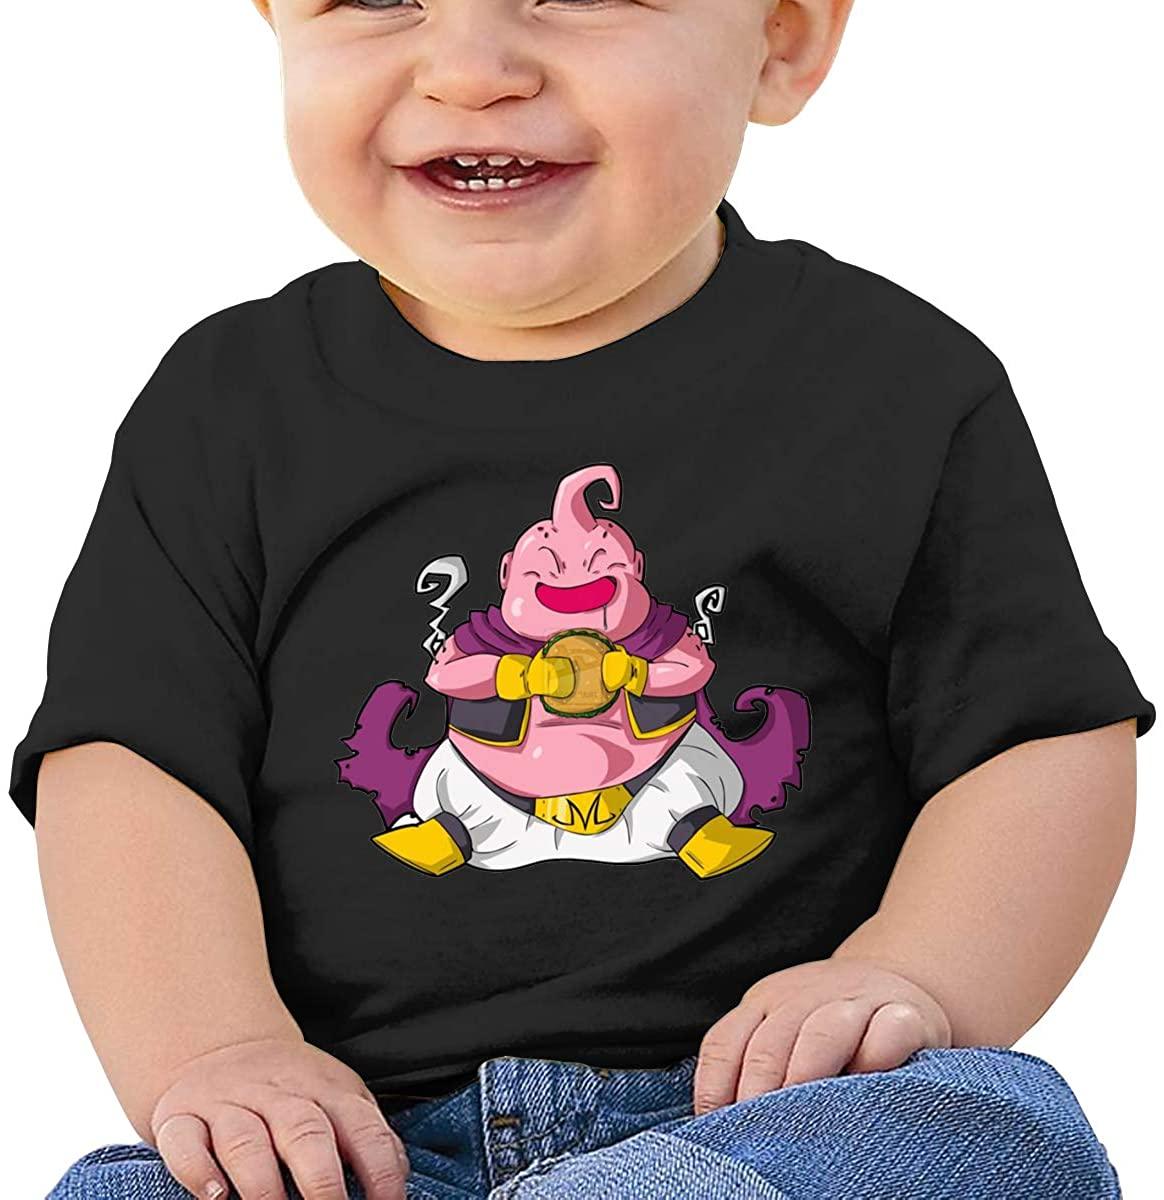 6-24 Months Boy and Girl Baby Short Sleeve T-Shirt Dragon Ball Majin Buu Elegant and Simple Design Black